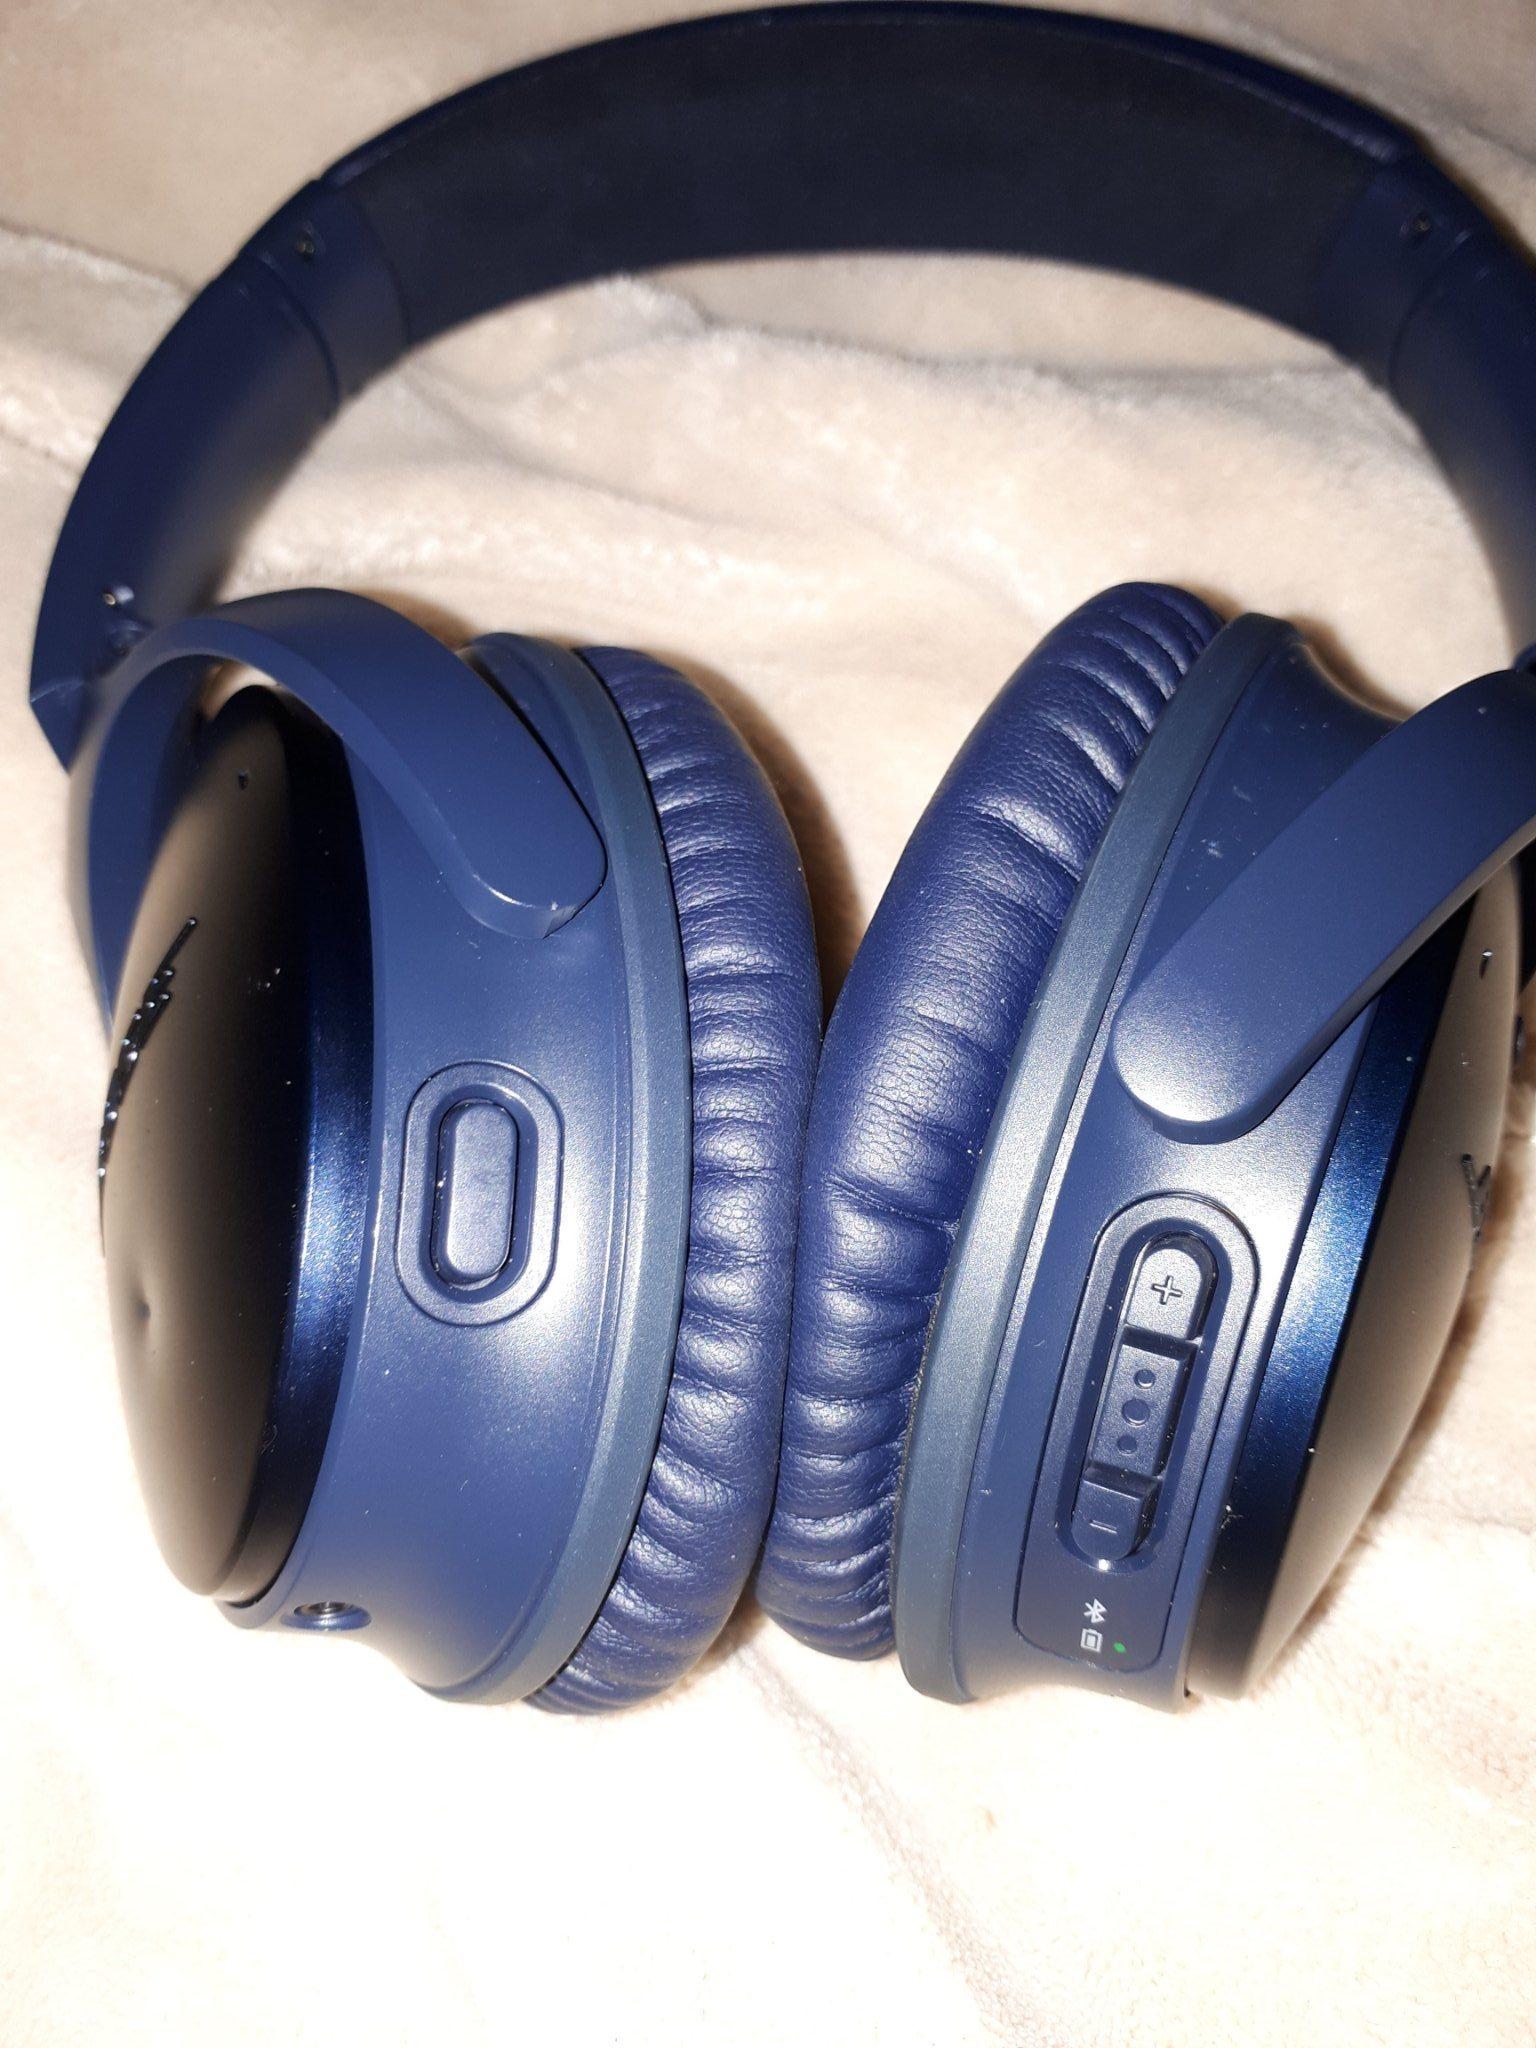 Bose QuietComfort 35 II Trådlösa hörlurar (over.. (342353921) ᐈ Köp ... 5302f1b1a047b